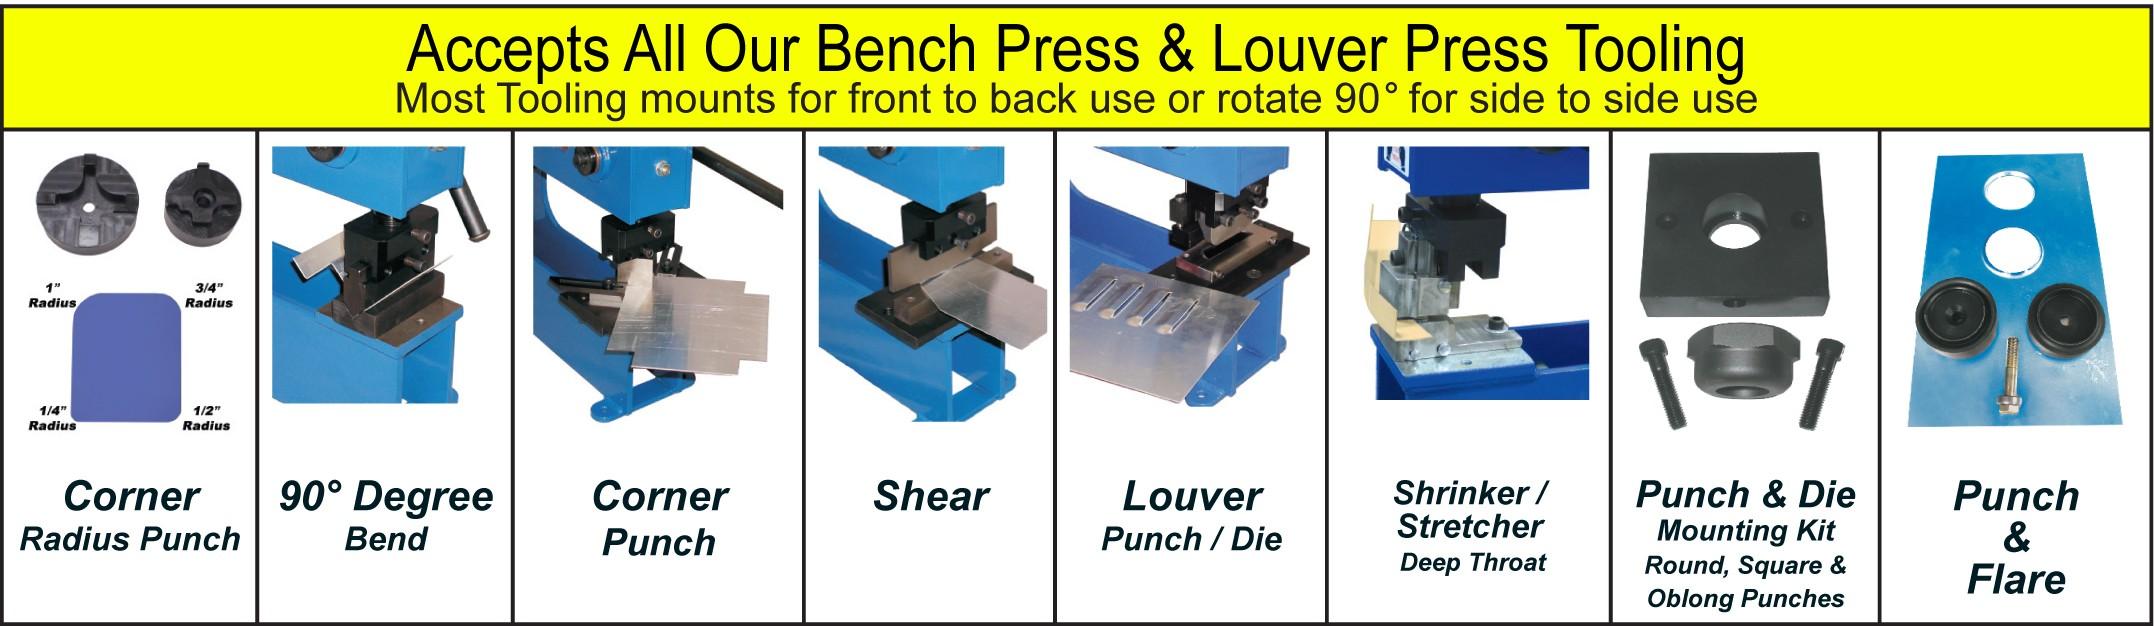 Mittler Bros  2240-44M Quad Manual Bench Press : Mittler Brot